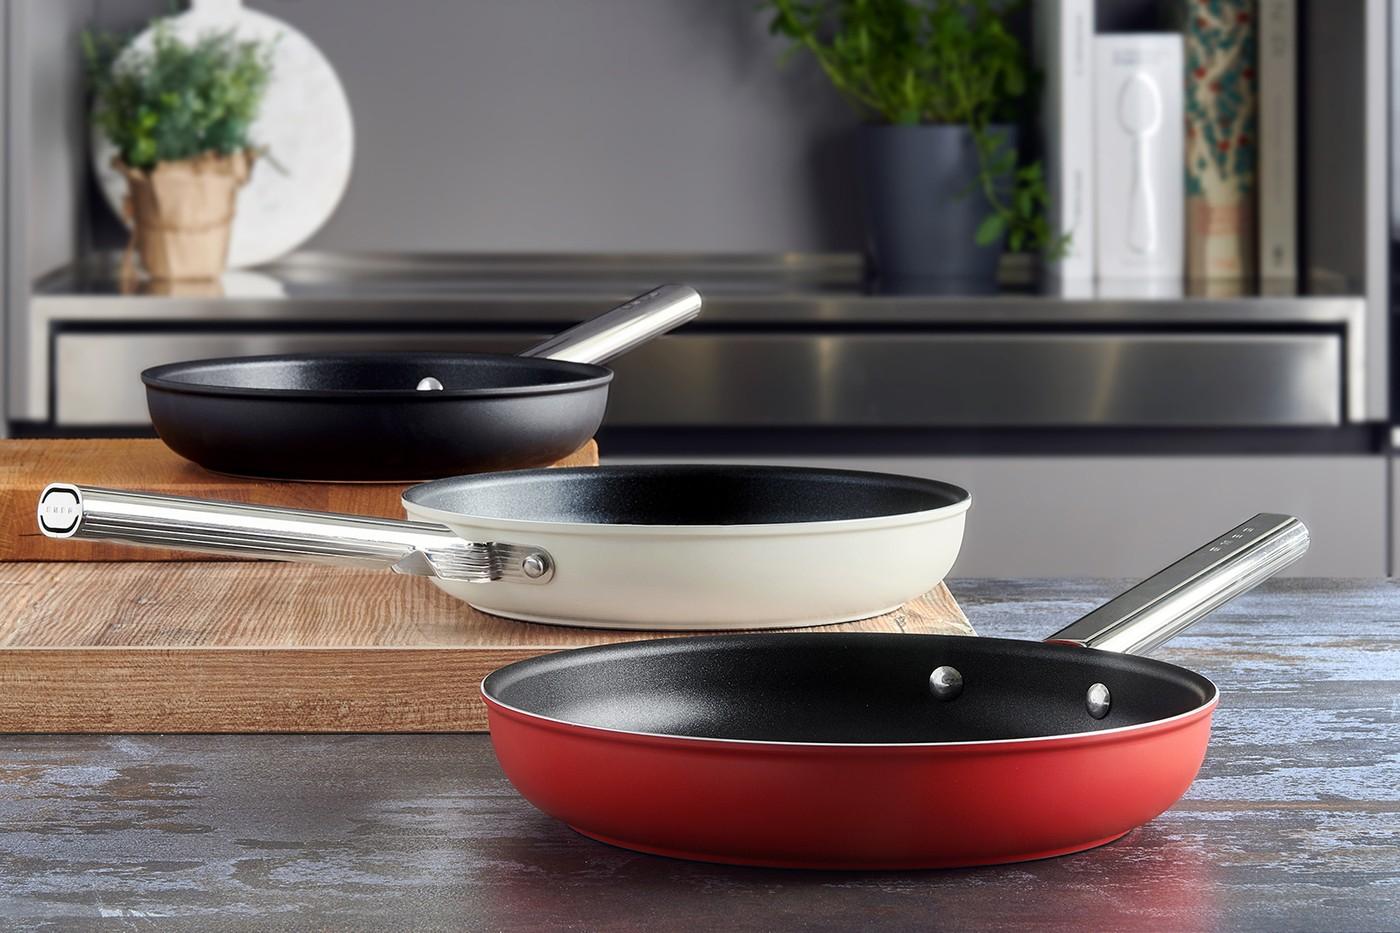 smeg cookware collection kitchen appliances lifestyle